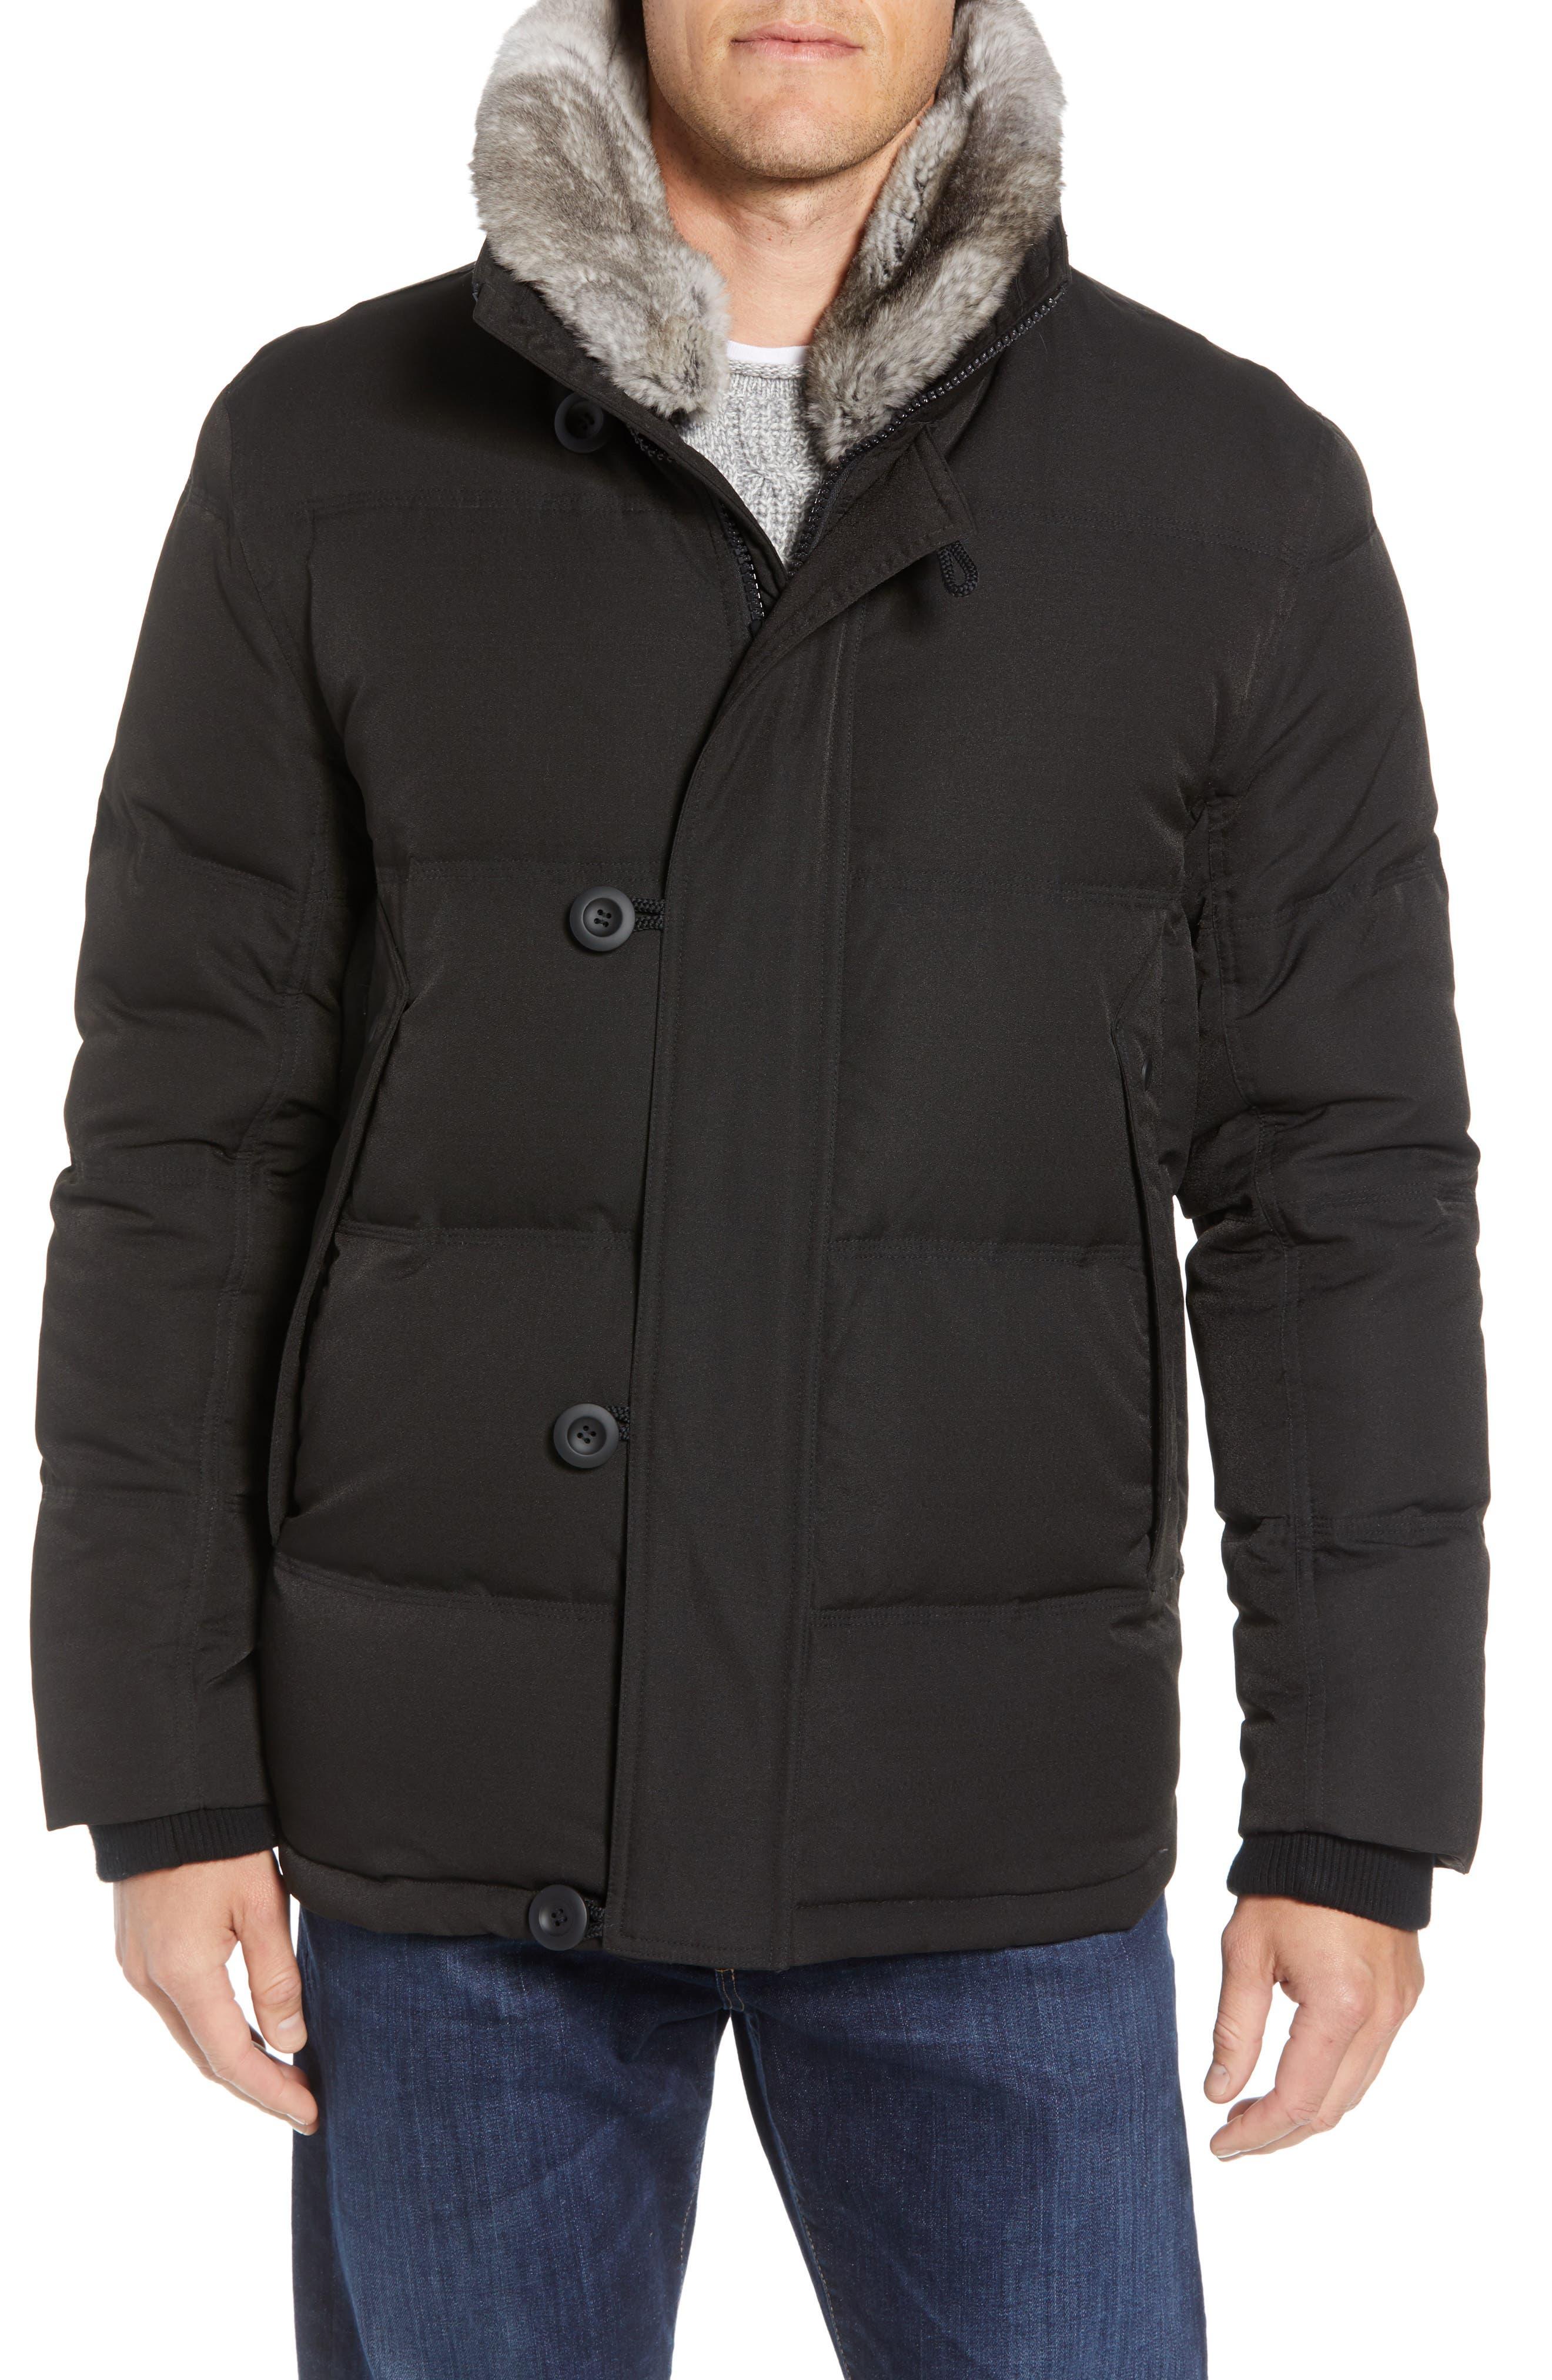 Andrew Marc Bryant Genuine Rabbit Fur Trim Down Jacket, Black